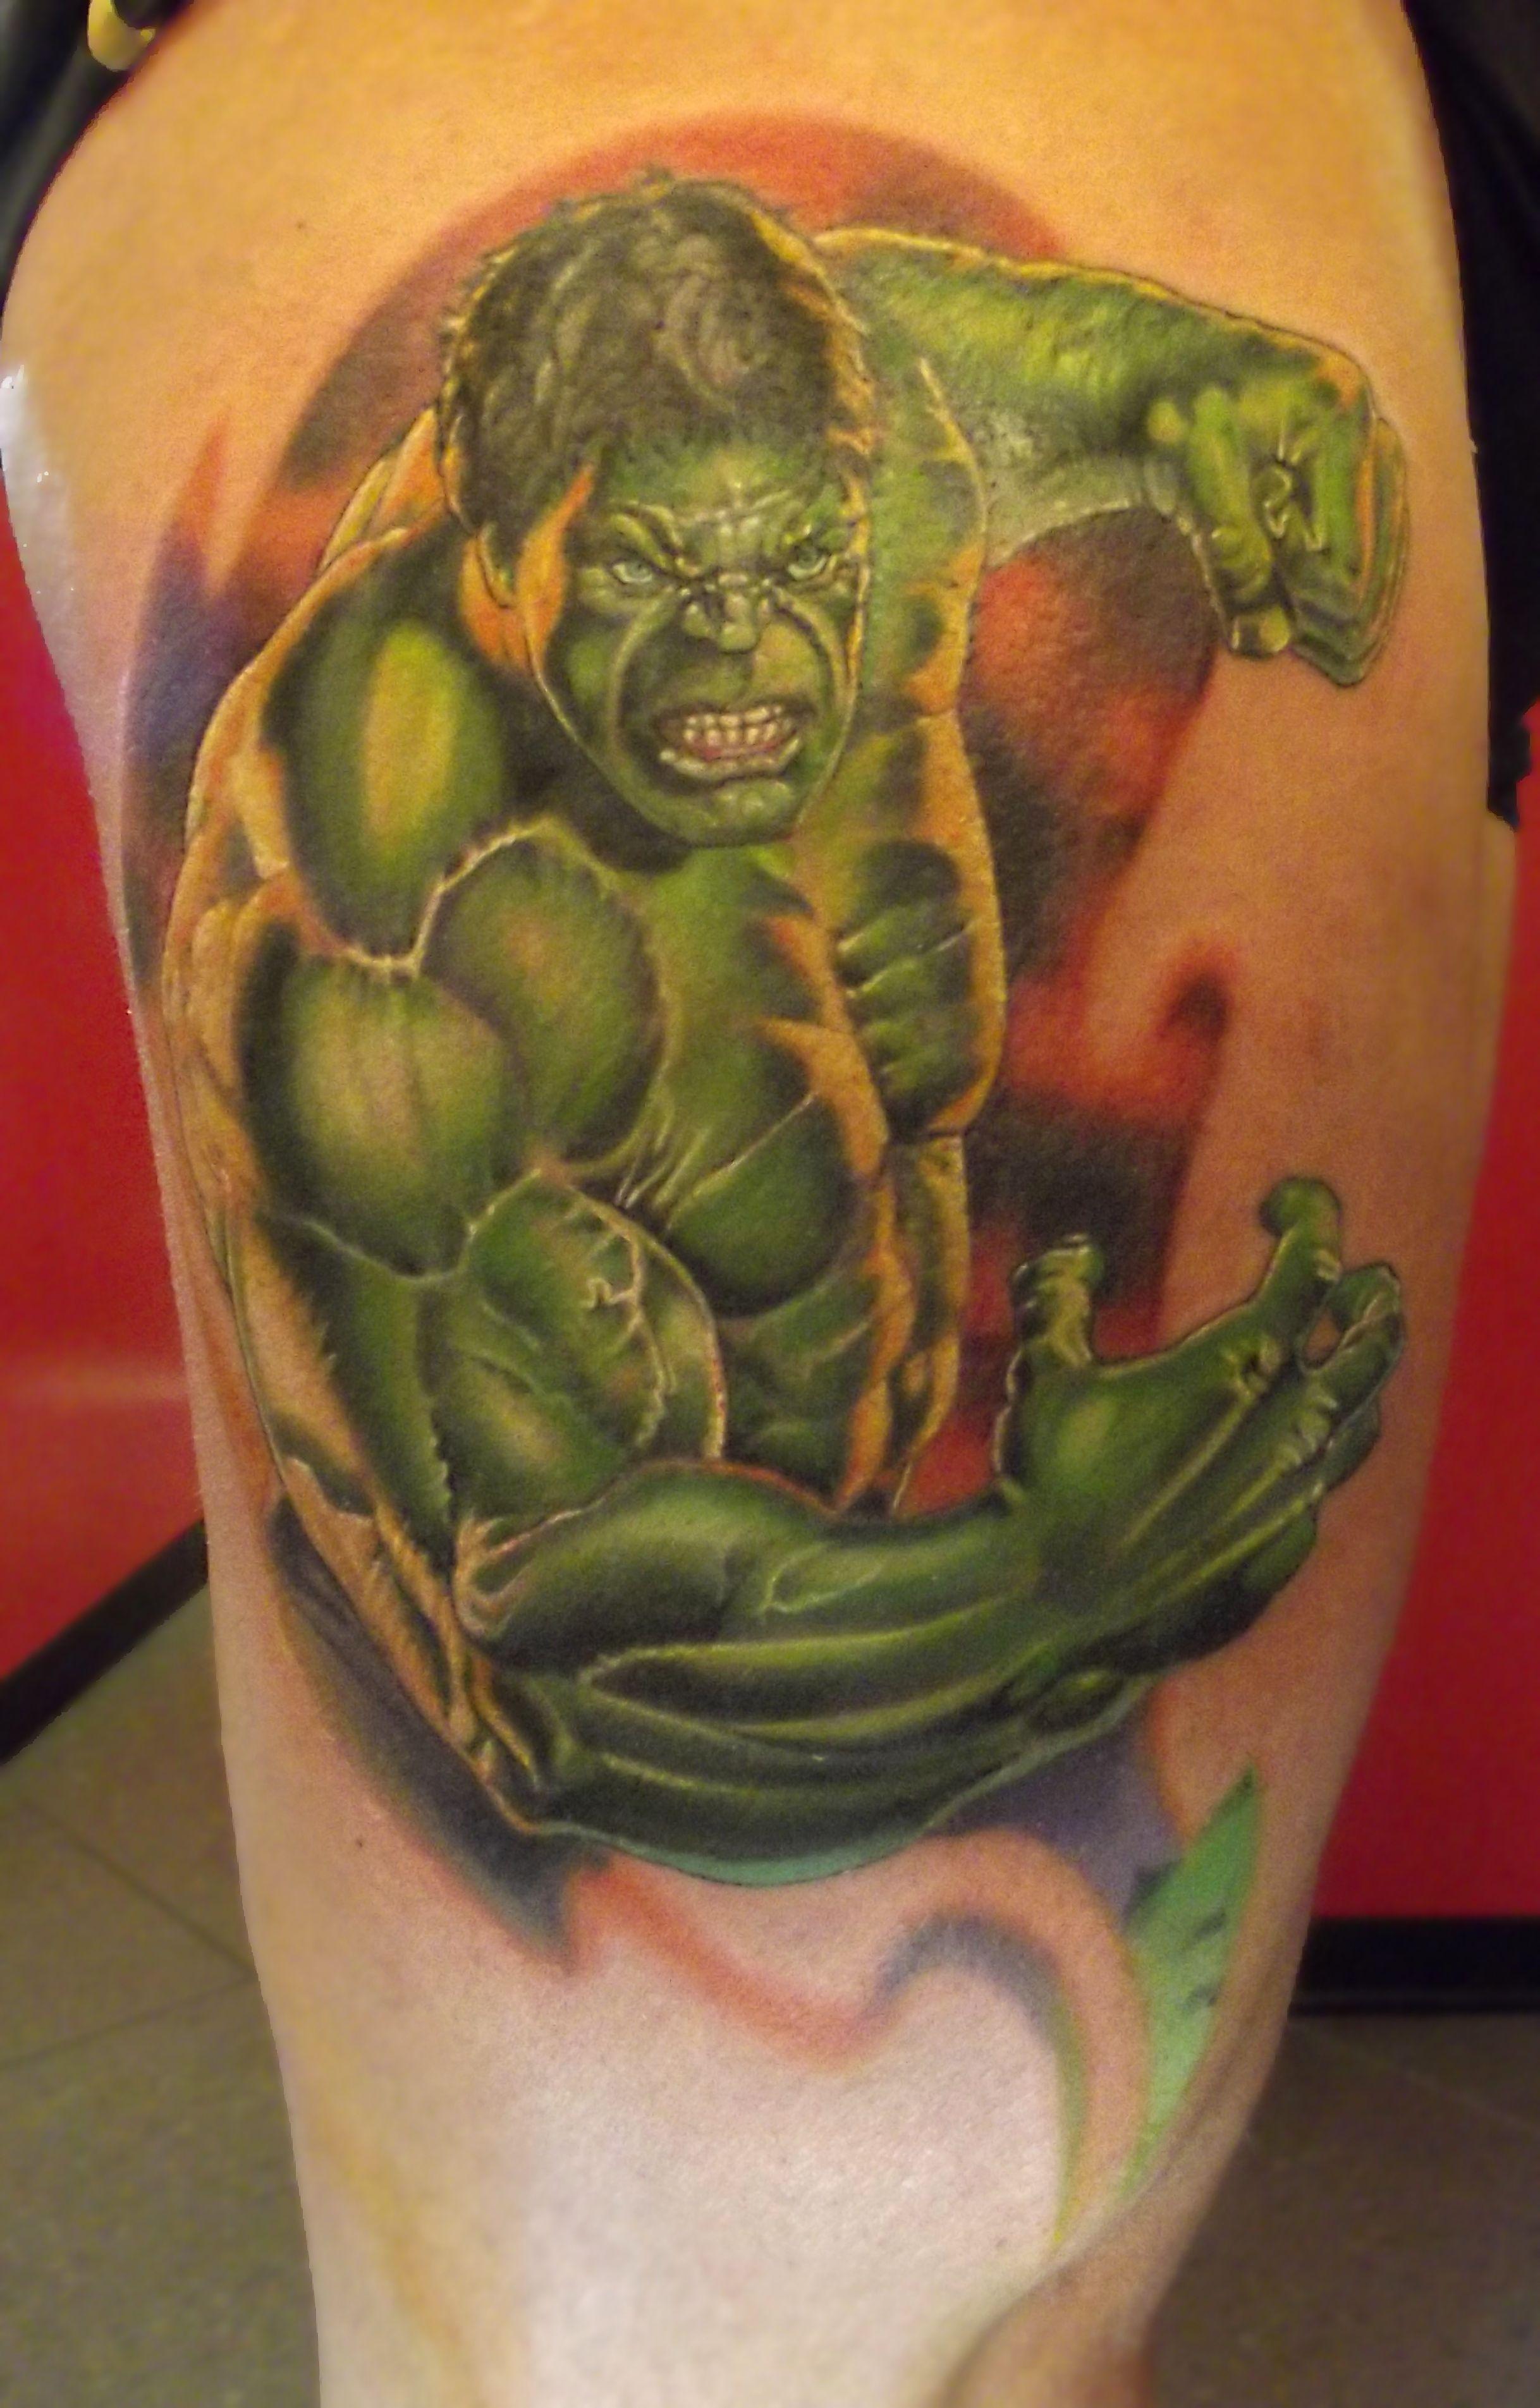 www.ettore-bechis.com Best Miami tattoo shop Hulk Tattoo by Ettore ...